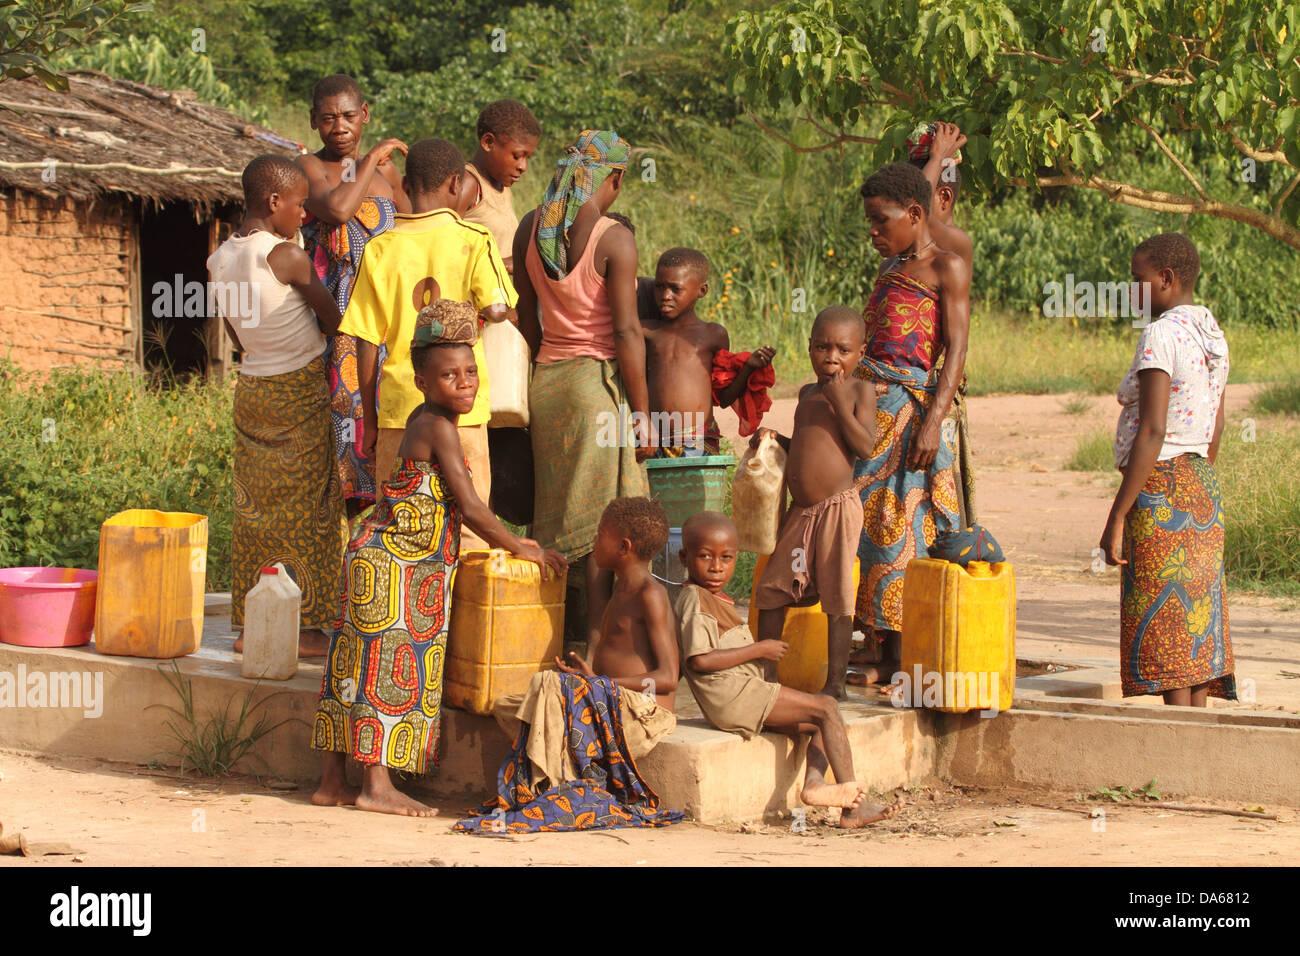 Etniche, minoranza, indigeni, persona, Pigmei, pigmei Baka, ben, Sangha, Dzanga Sangha, Bayanga, Bacino del Congo, Immagini Stock